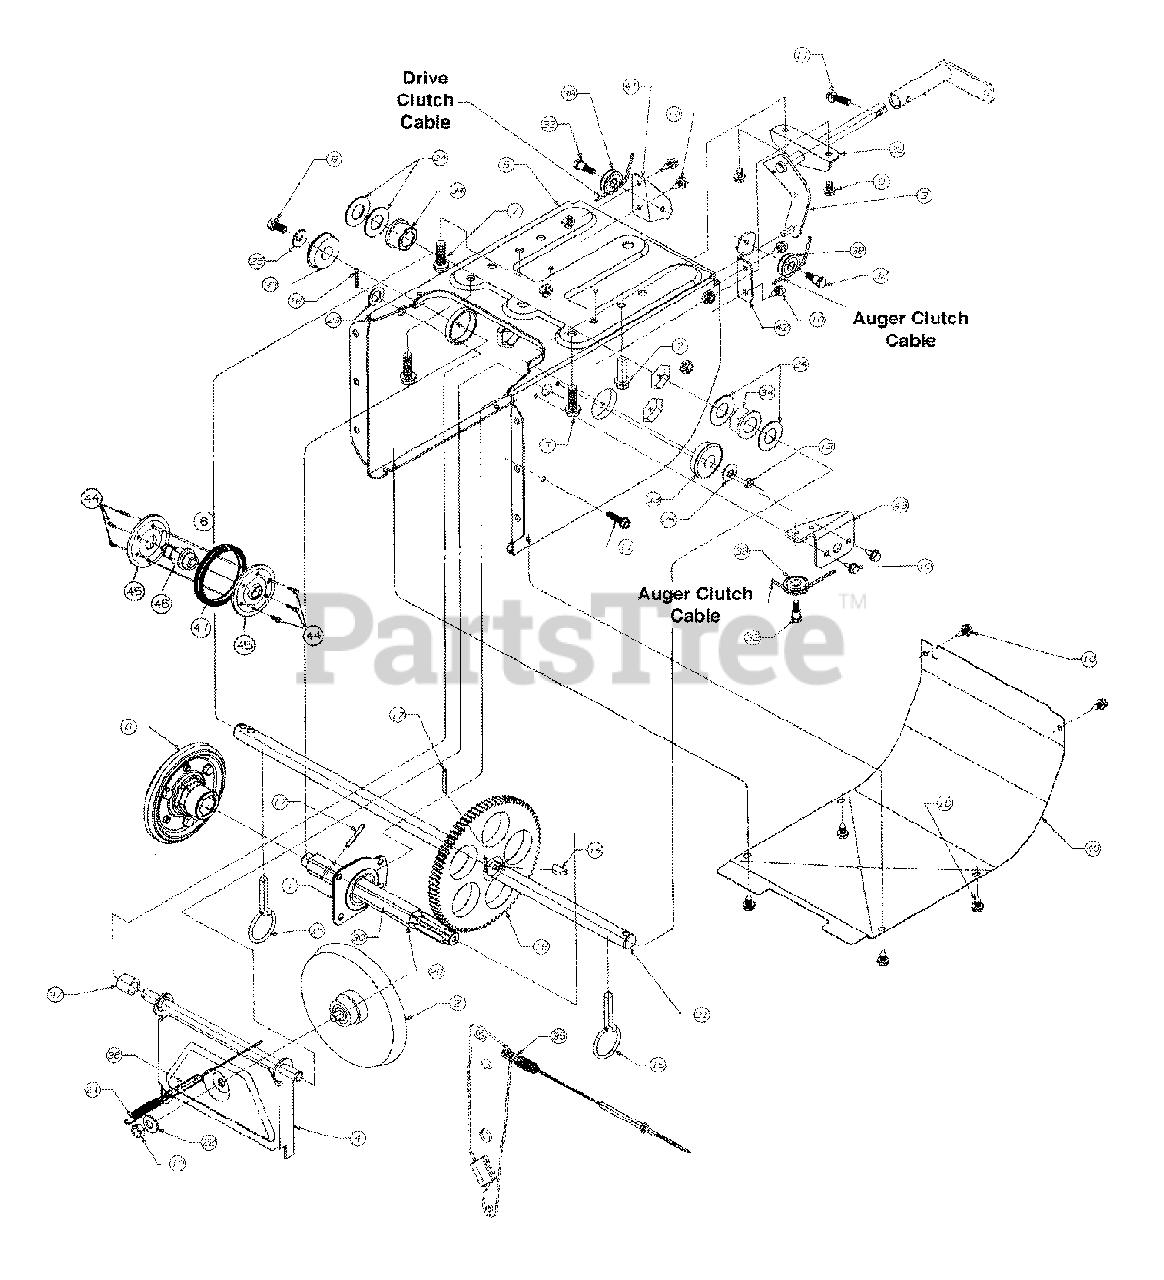 White Outdoor Sb 950 317e653f190